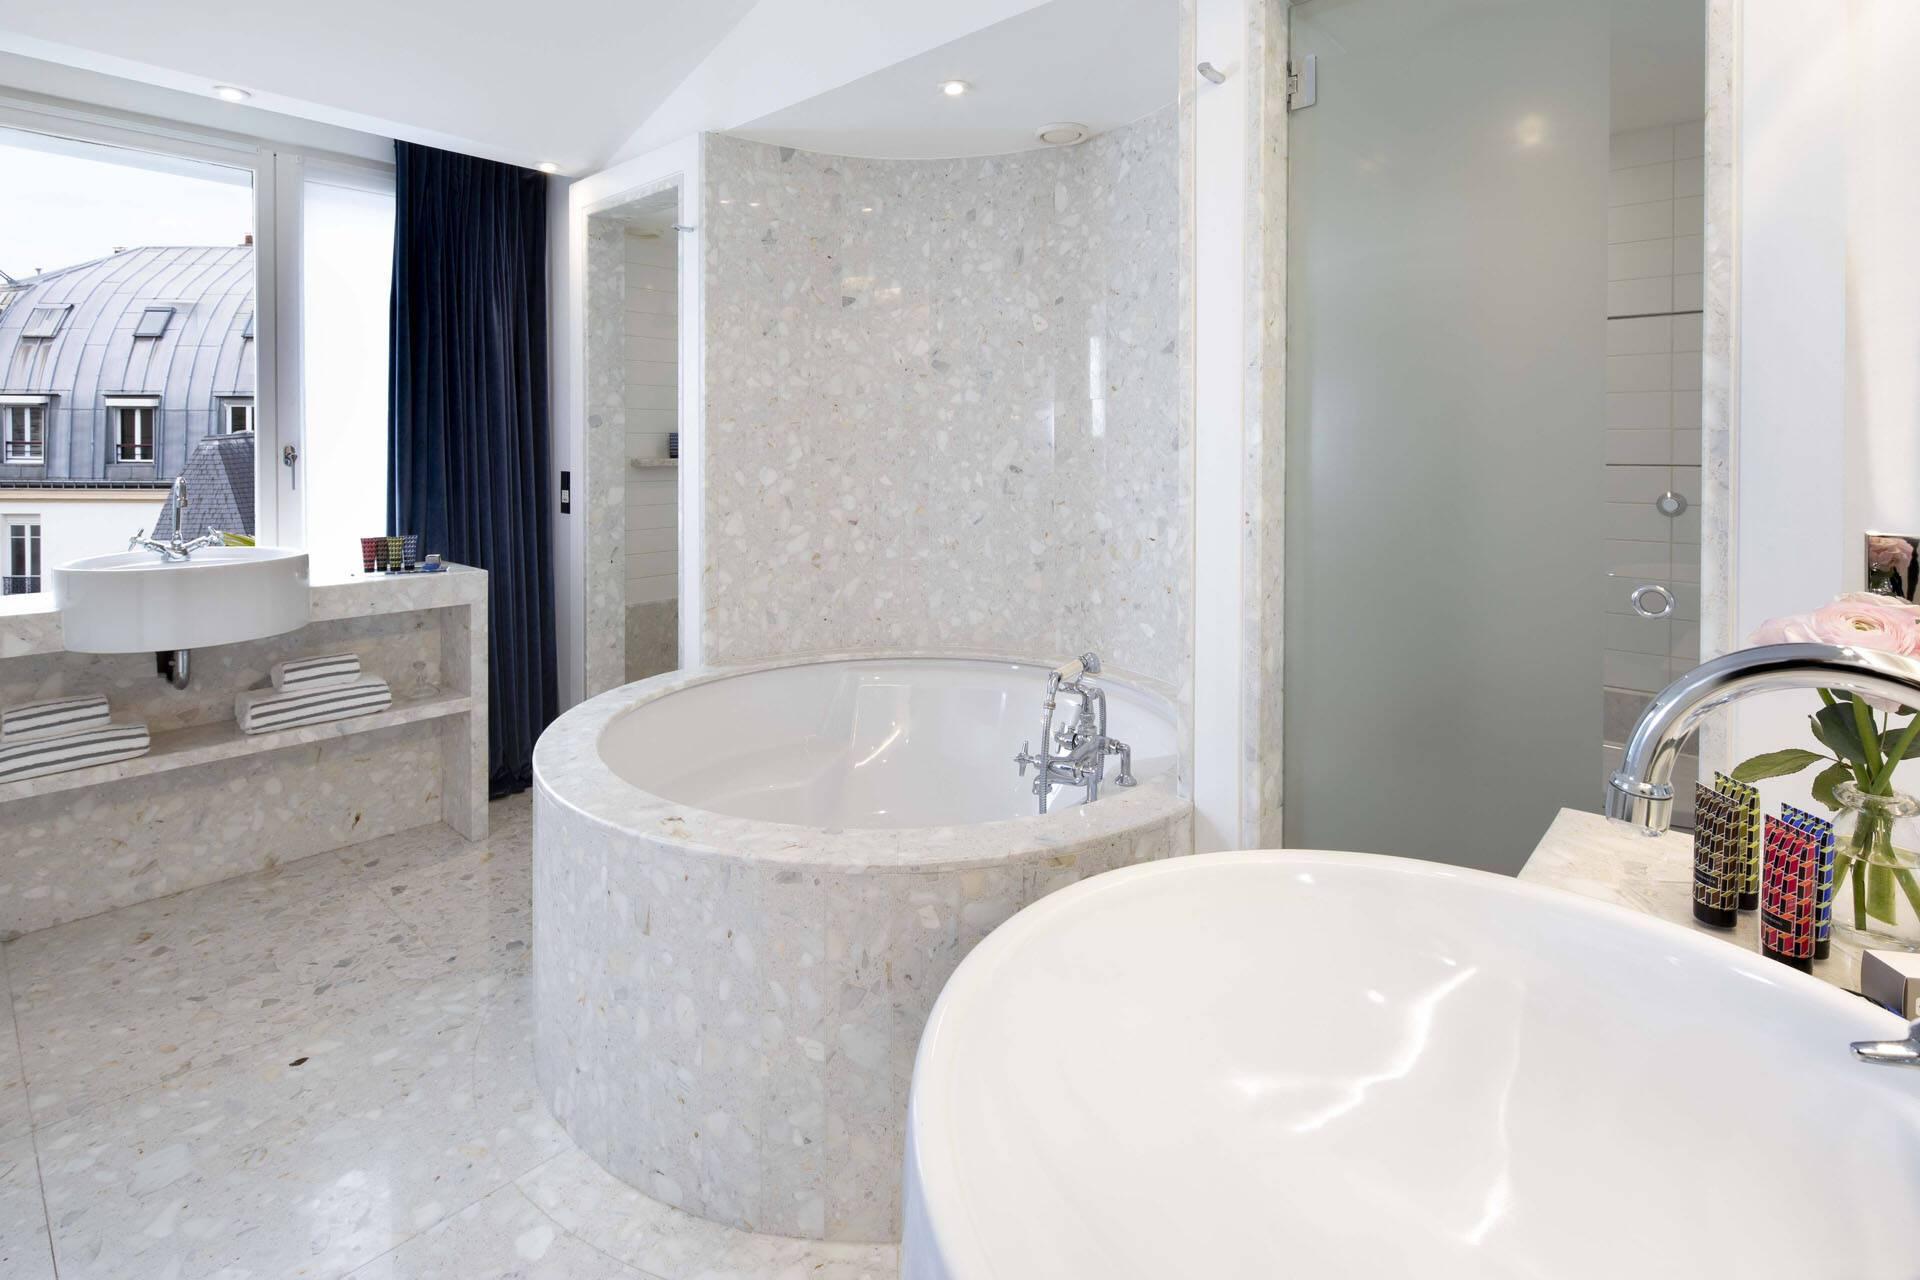 Hotel Sers Paris Chambre 3175